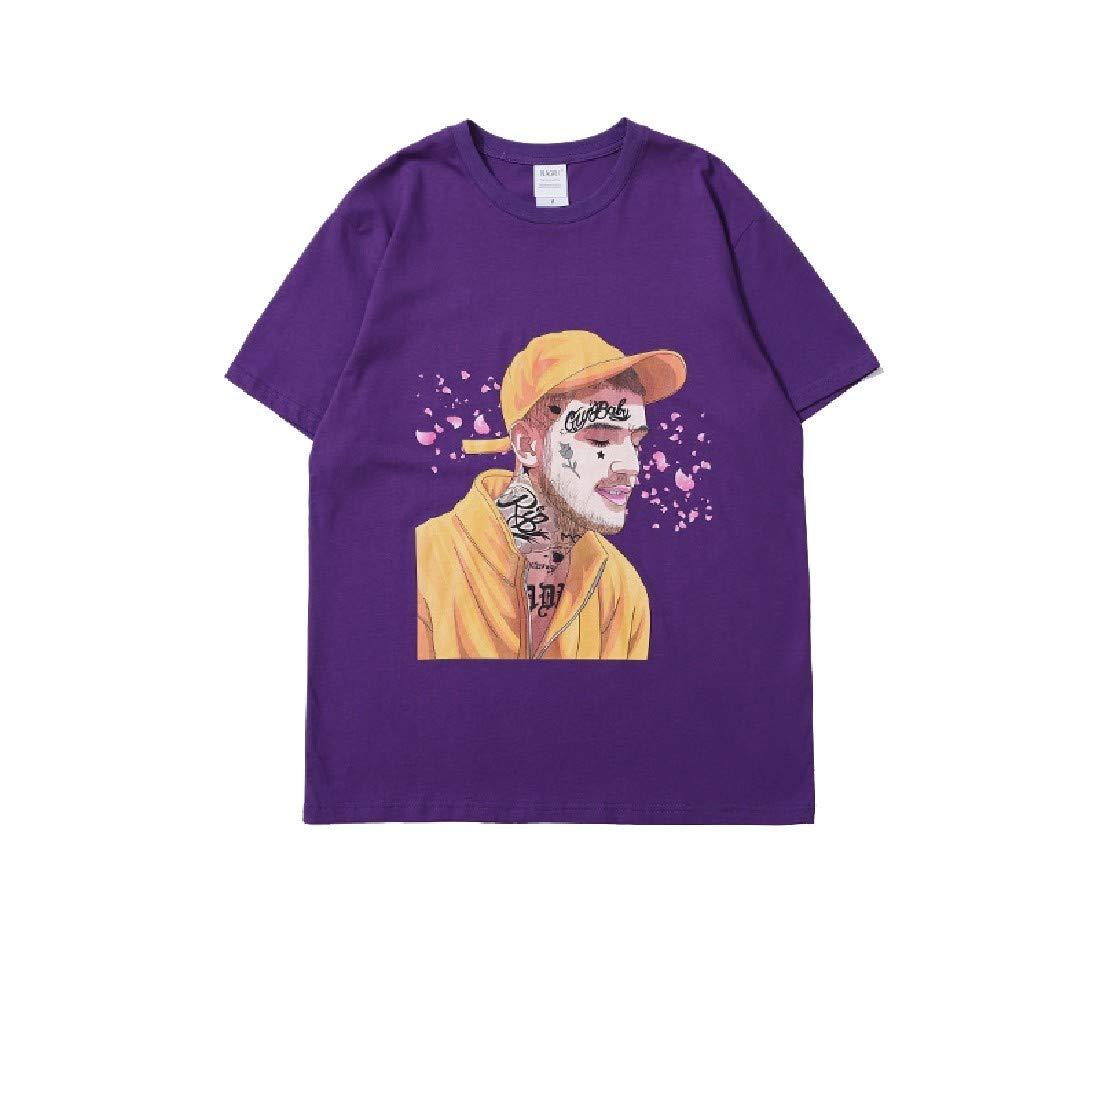 YUNY Mens Spring Spring Summer Short Sleeve Cartoon Summer Floral Scoop Polo Top Tshirt Purple S